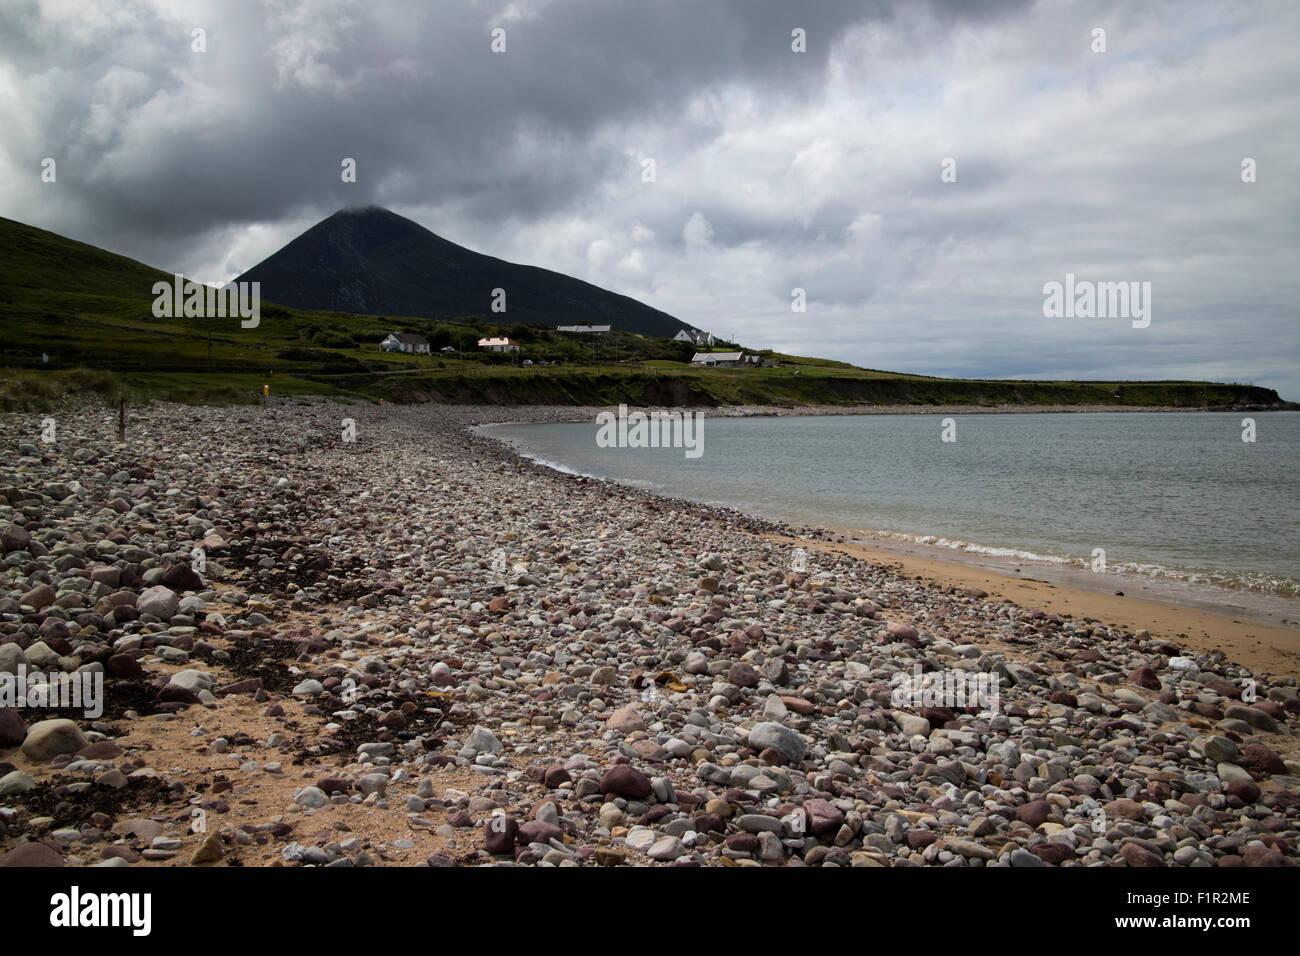 golden strand Barnynagappul Strand with view of slievemore Achill Island County Mayo Ireland - Stock Image